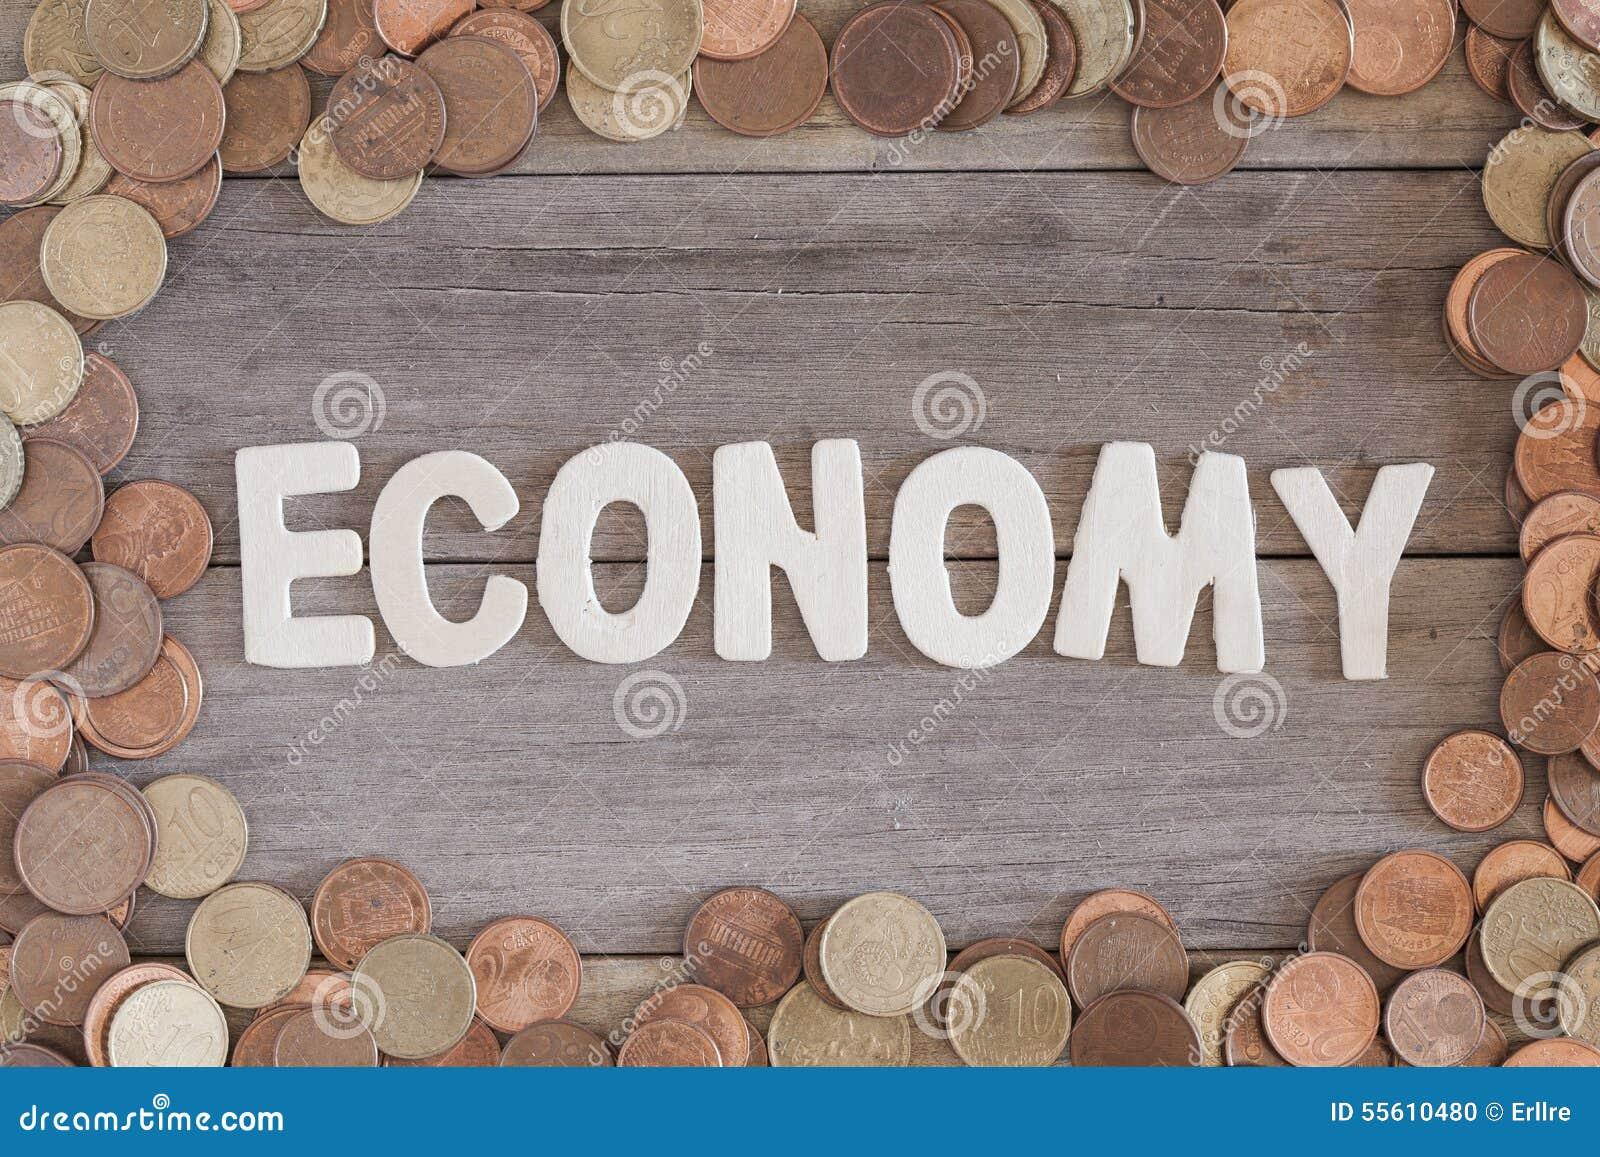 Economy Stock Photo - Image: 55610480